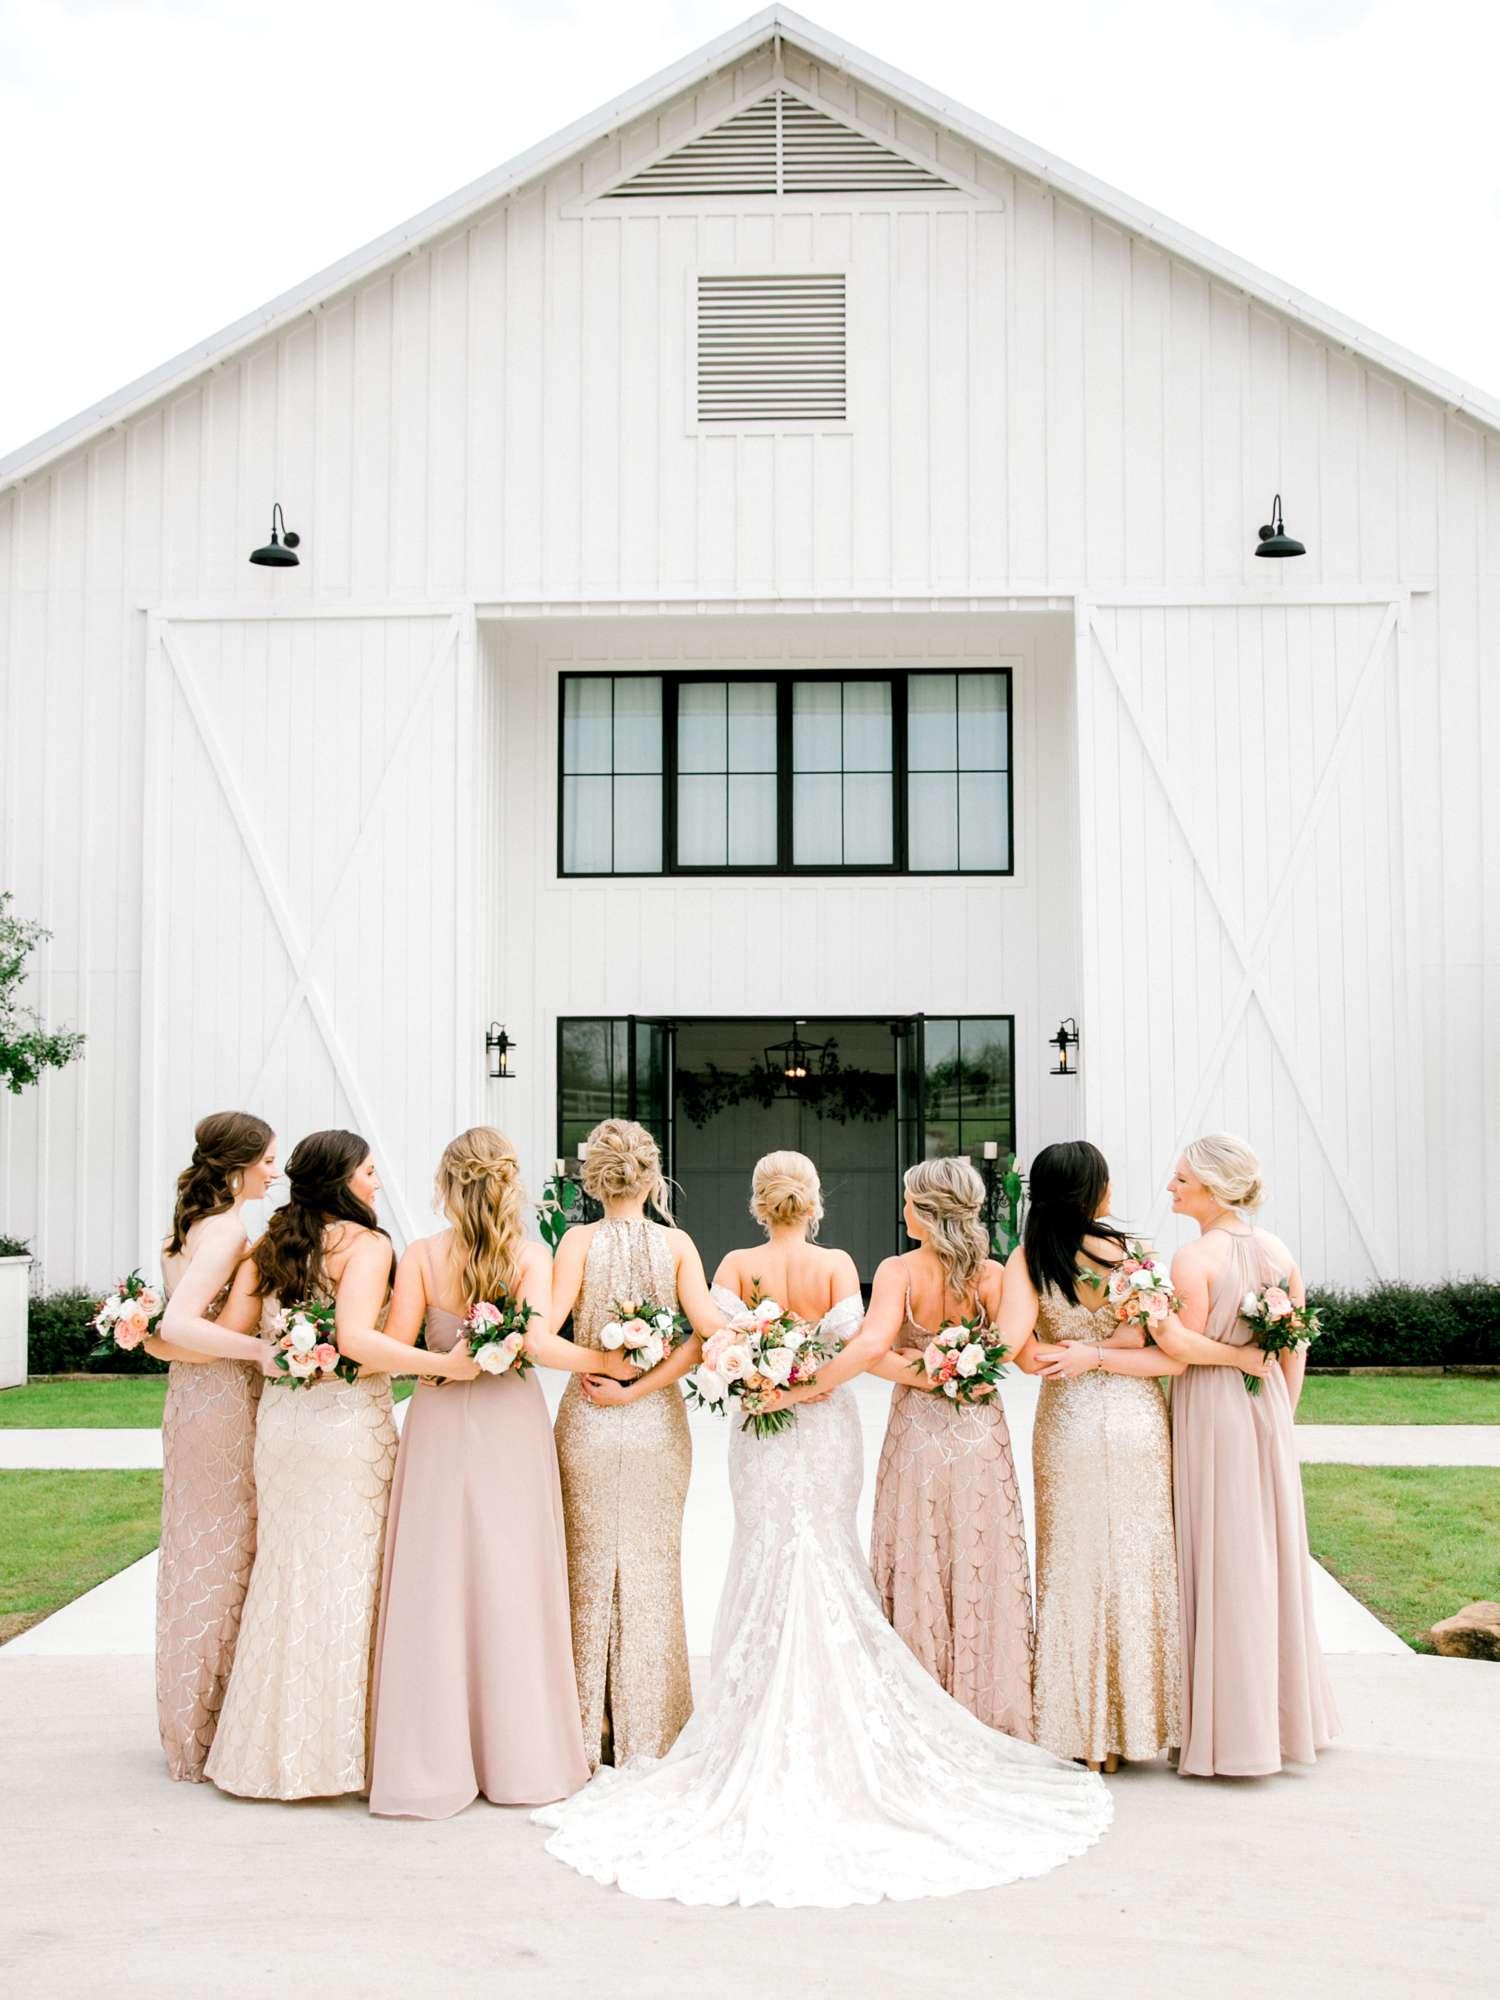 HEBERT_MORGAN_AND_CLAY_ALLEEJ_THE_FARMHOUSE_MONTGOMERY_TEXAS_WEDDING_0026.jpg